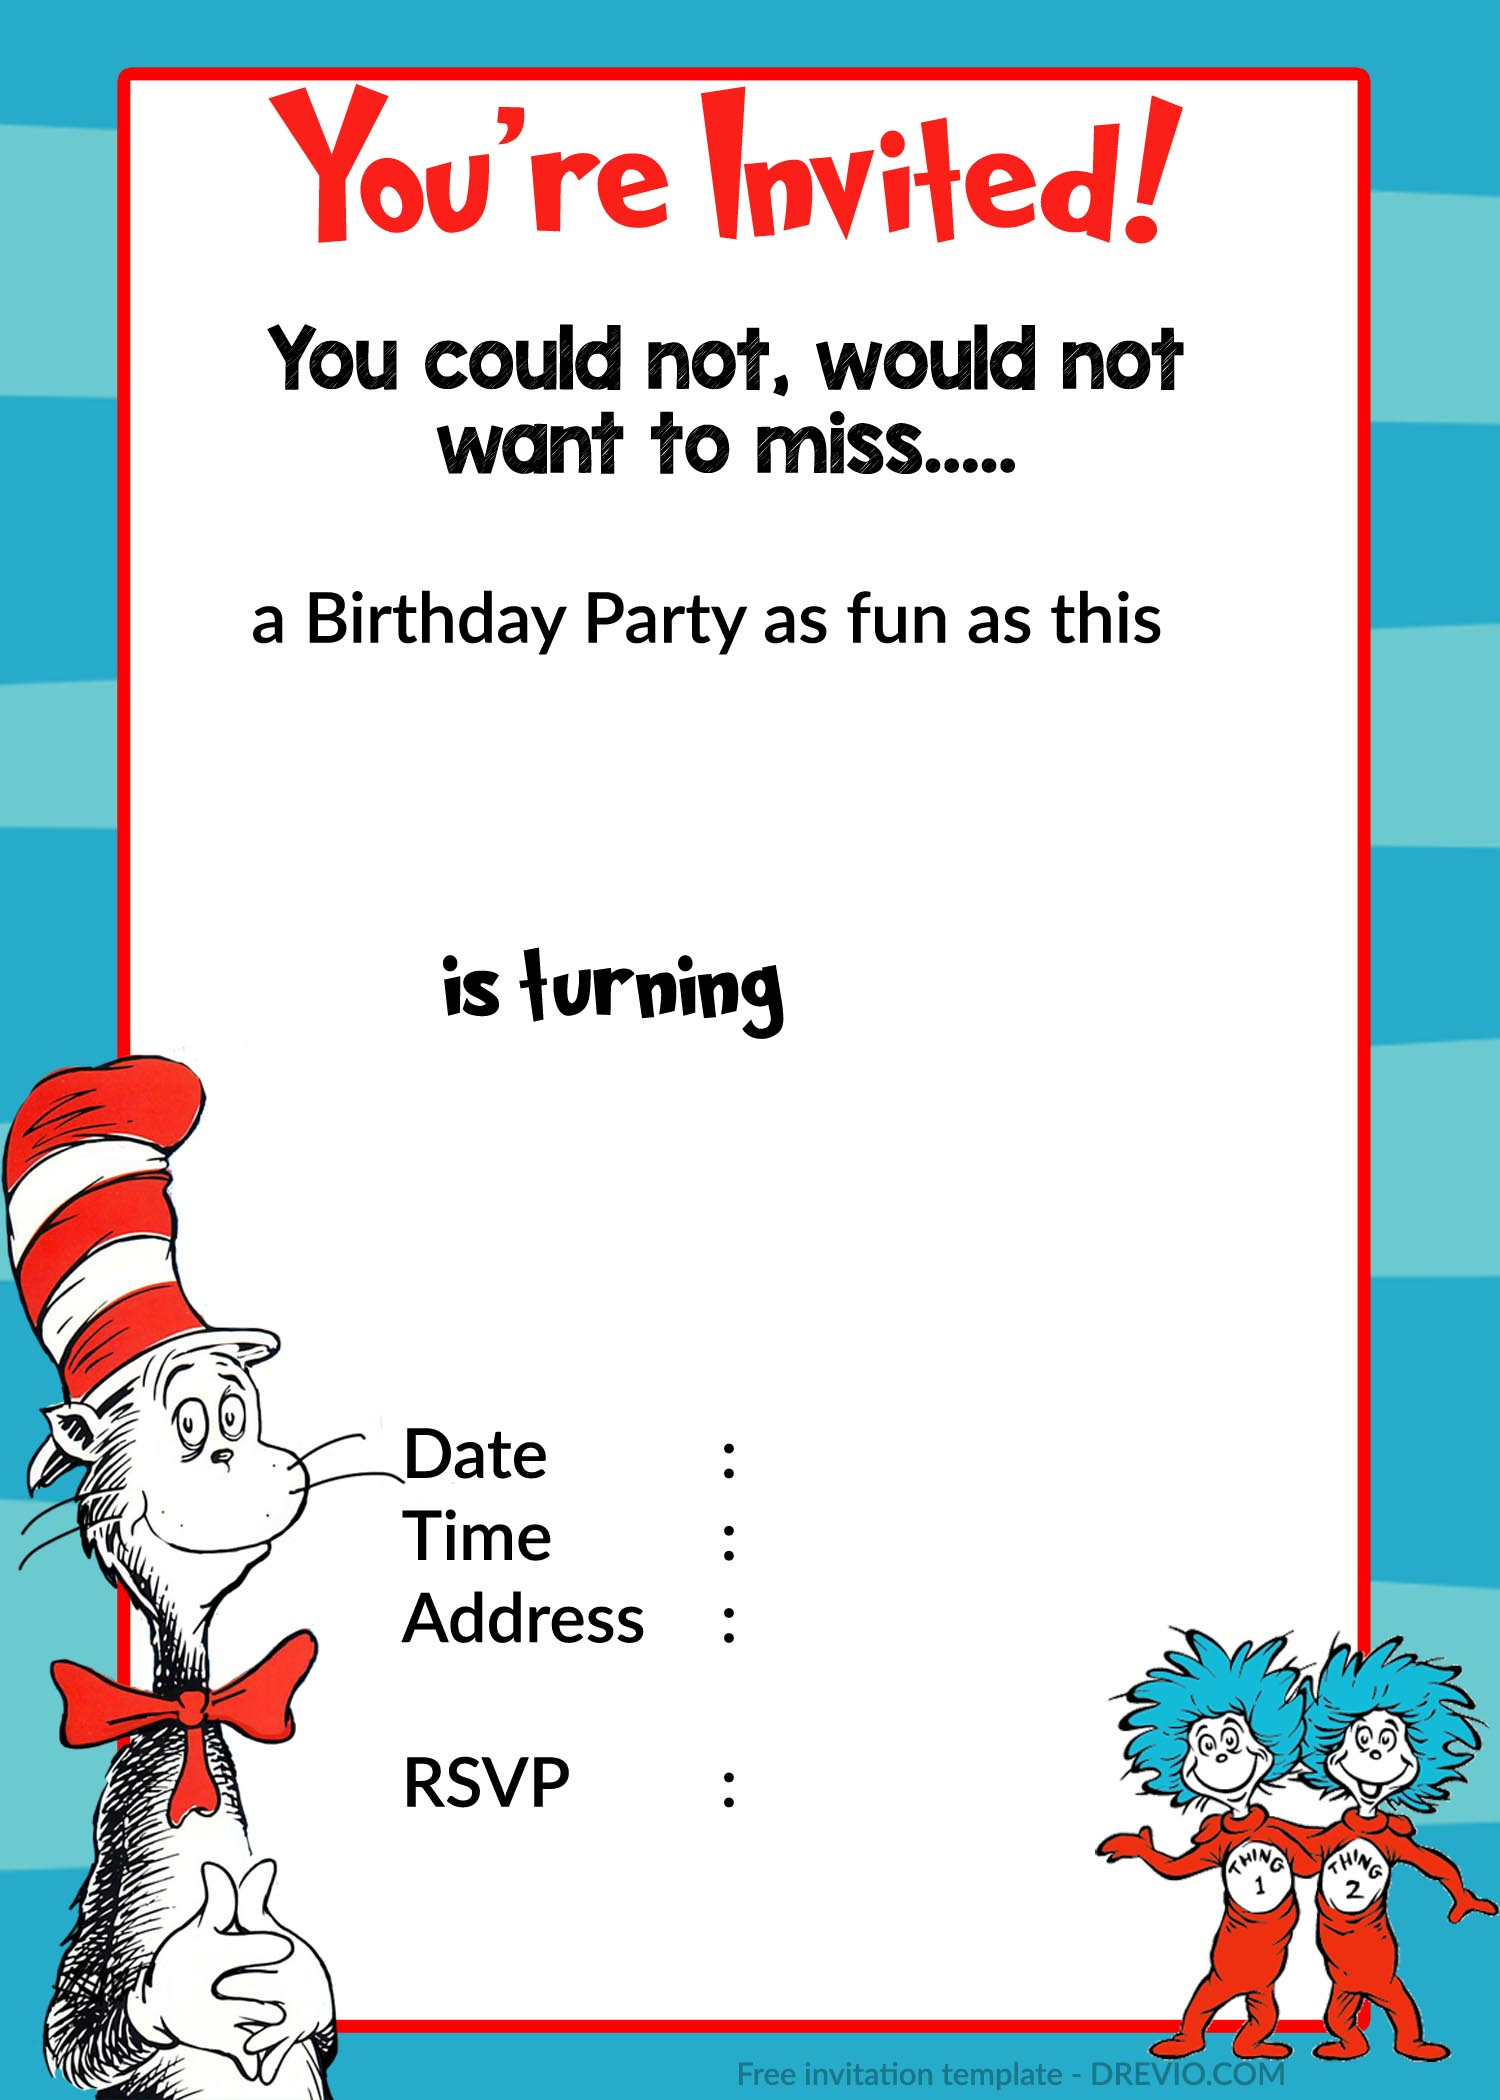 Free Printable Dr Seuss Birthday Invitations Download Hundreds Free Printable Birthday Invitation Templates